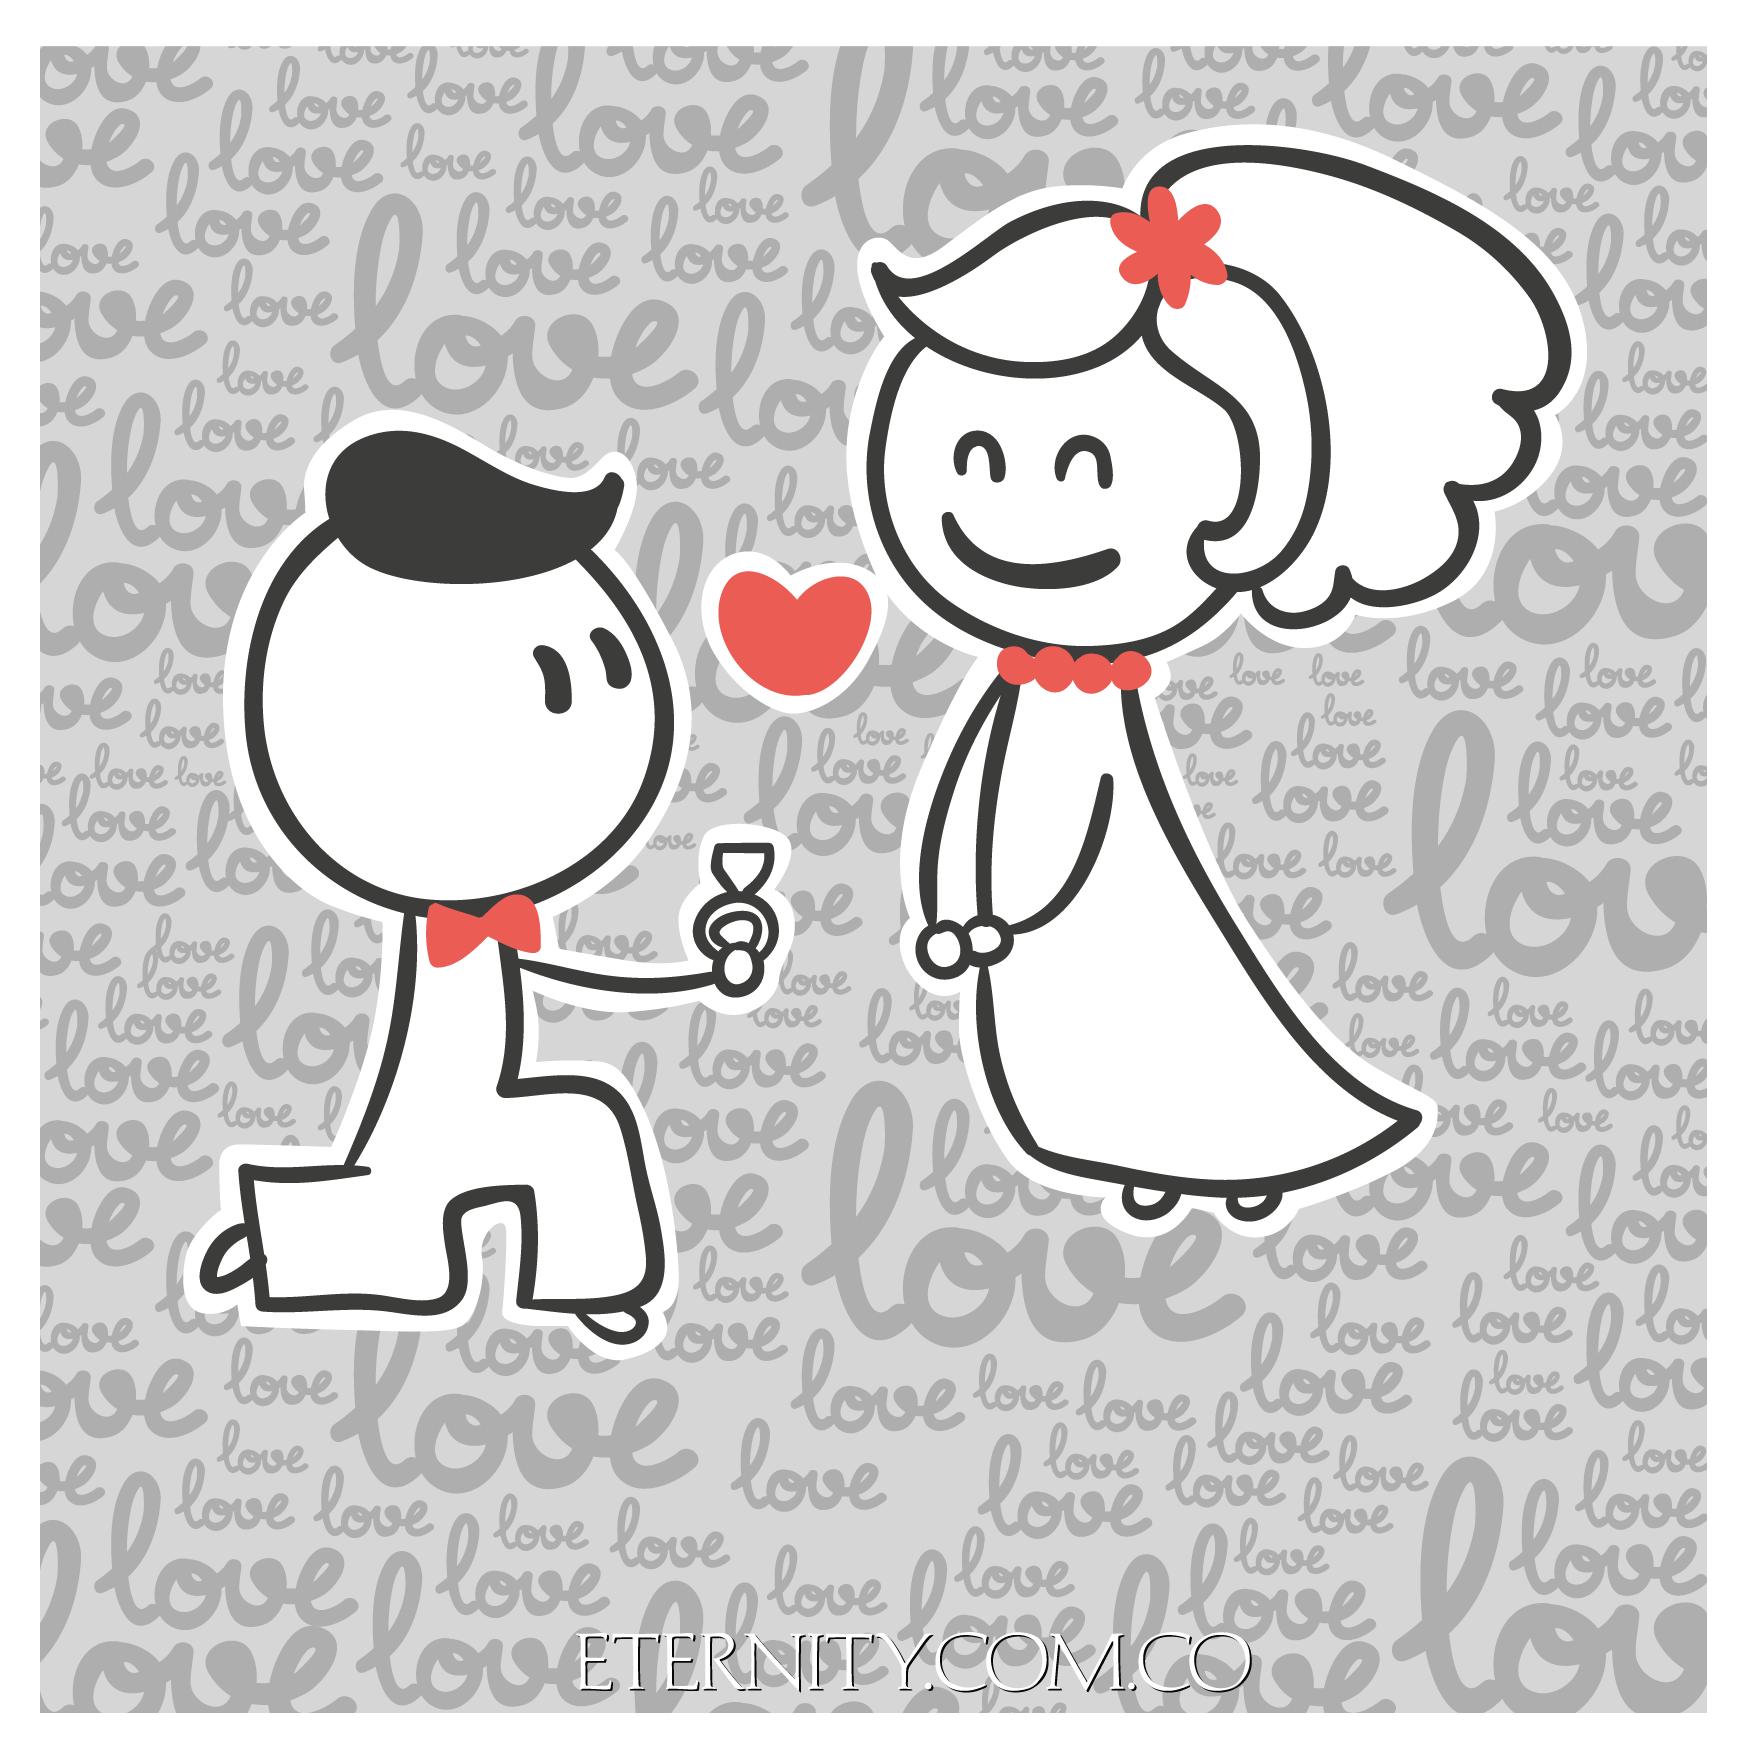 Anillos De Compromiso Eternityjoyeria Deseos De San Valentin Historieta Graciosa Feliz Dia De San Valentin